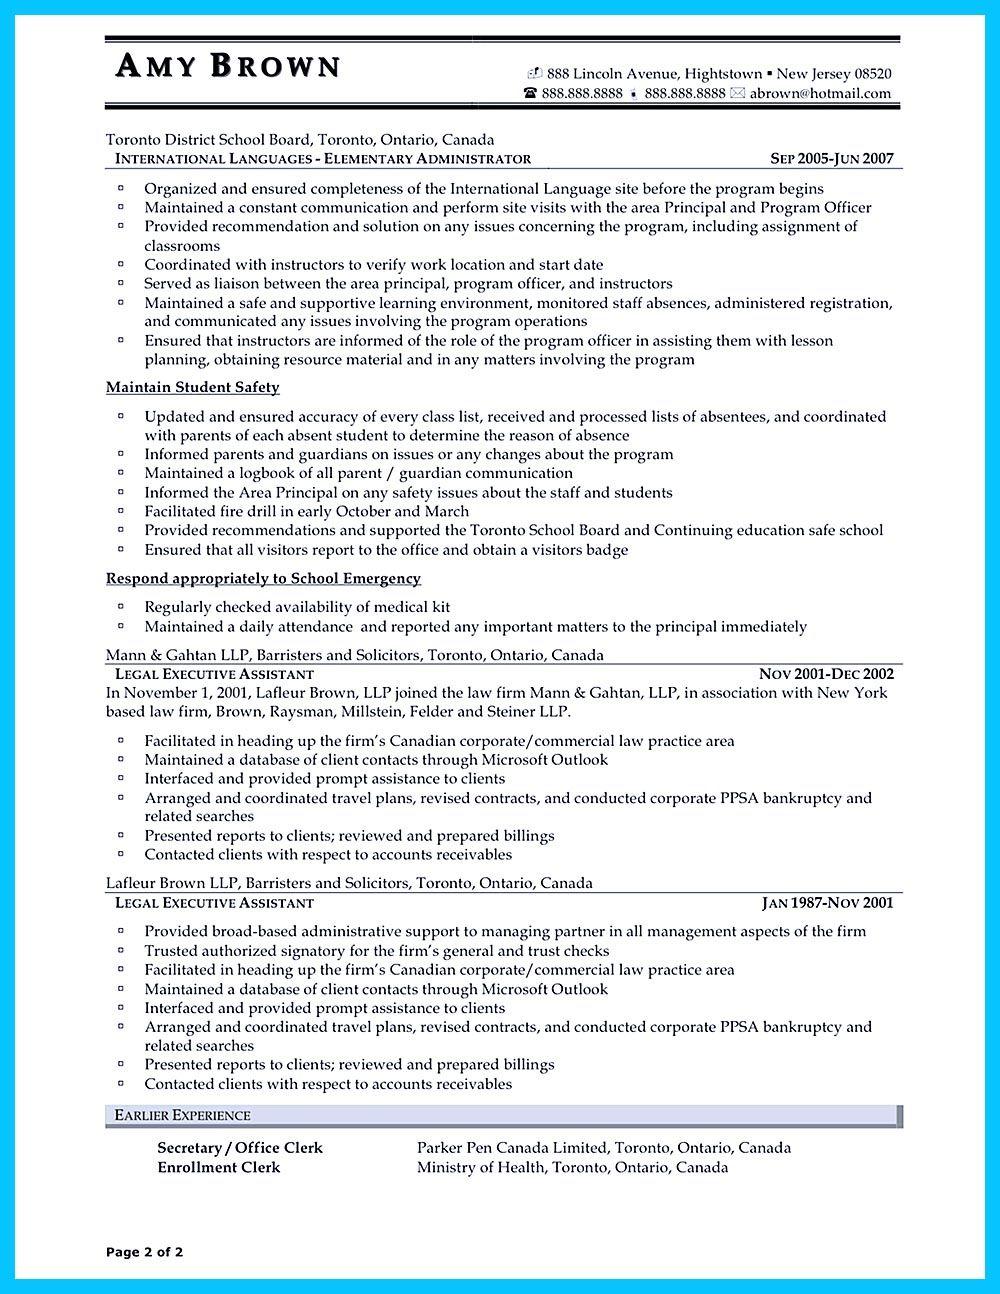 resume key word